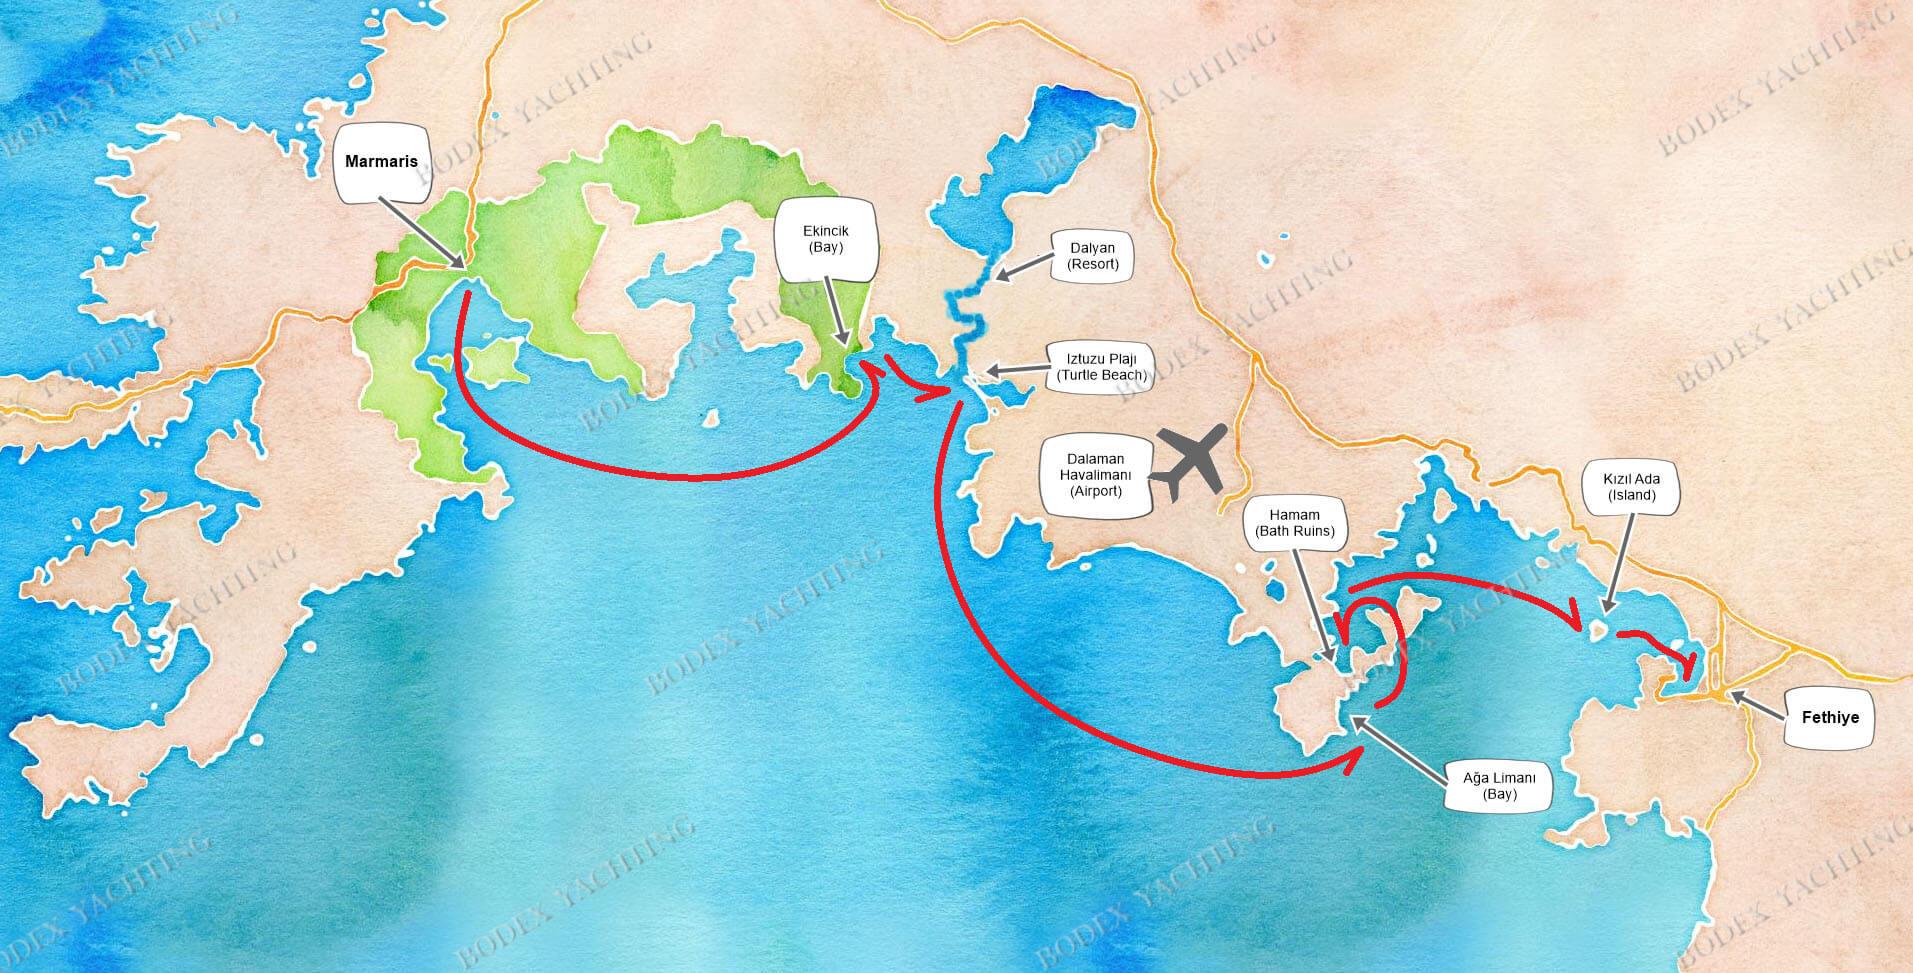 CABIN Charter - Marmaris to Fethiye